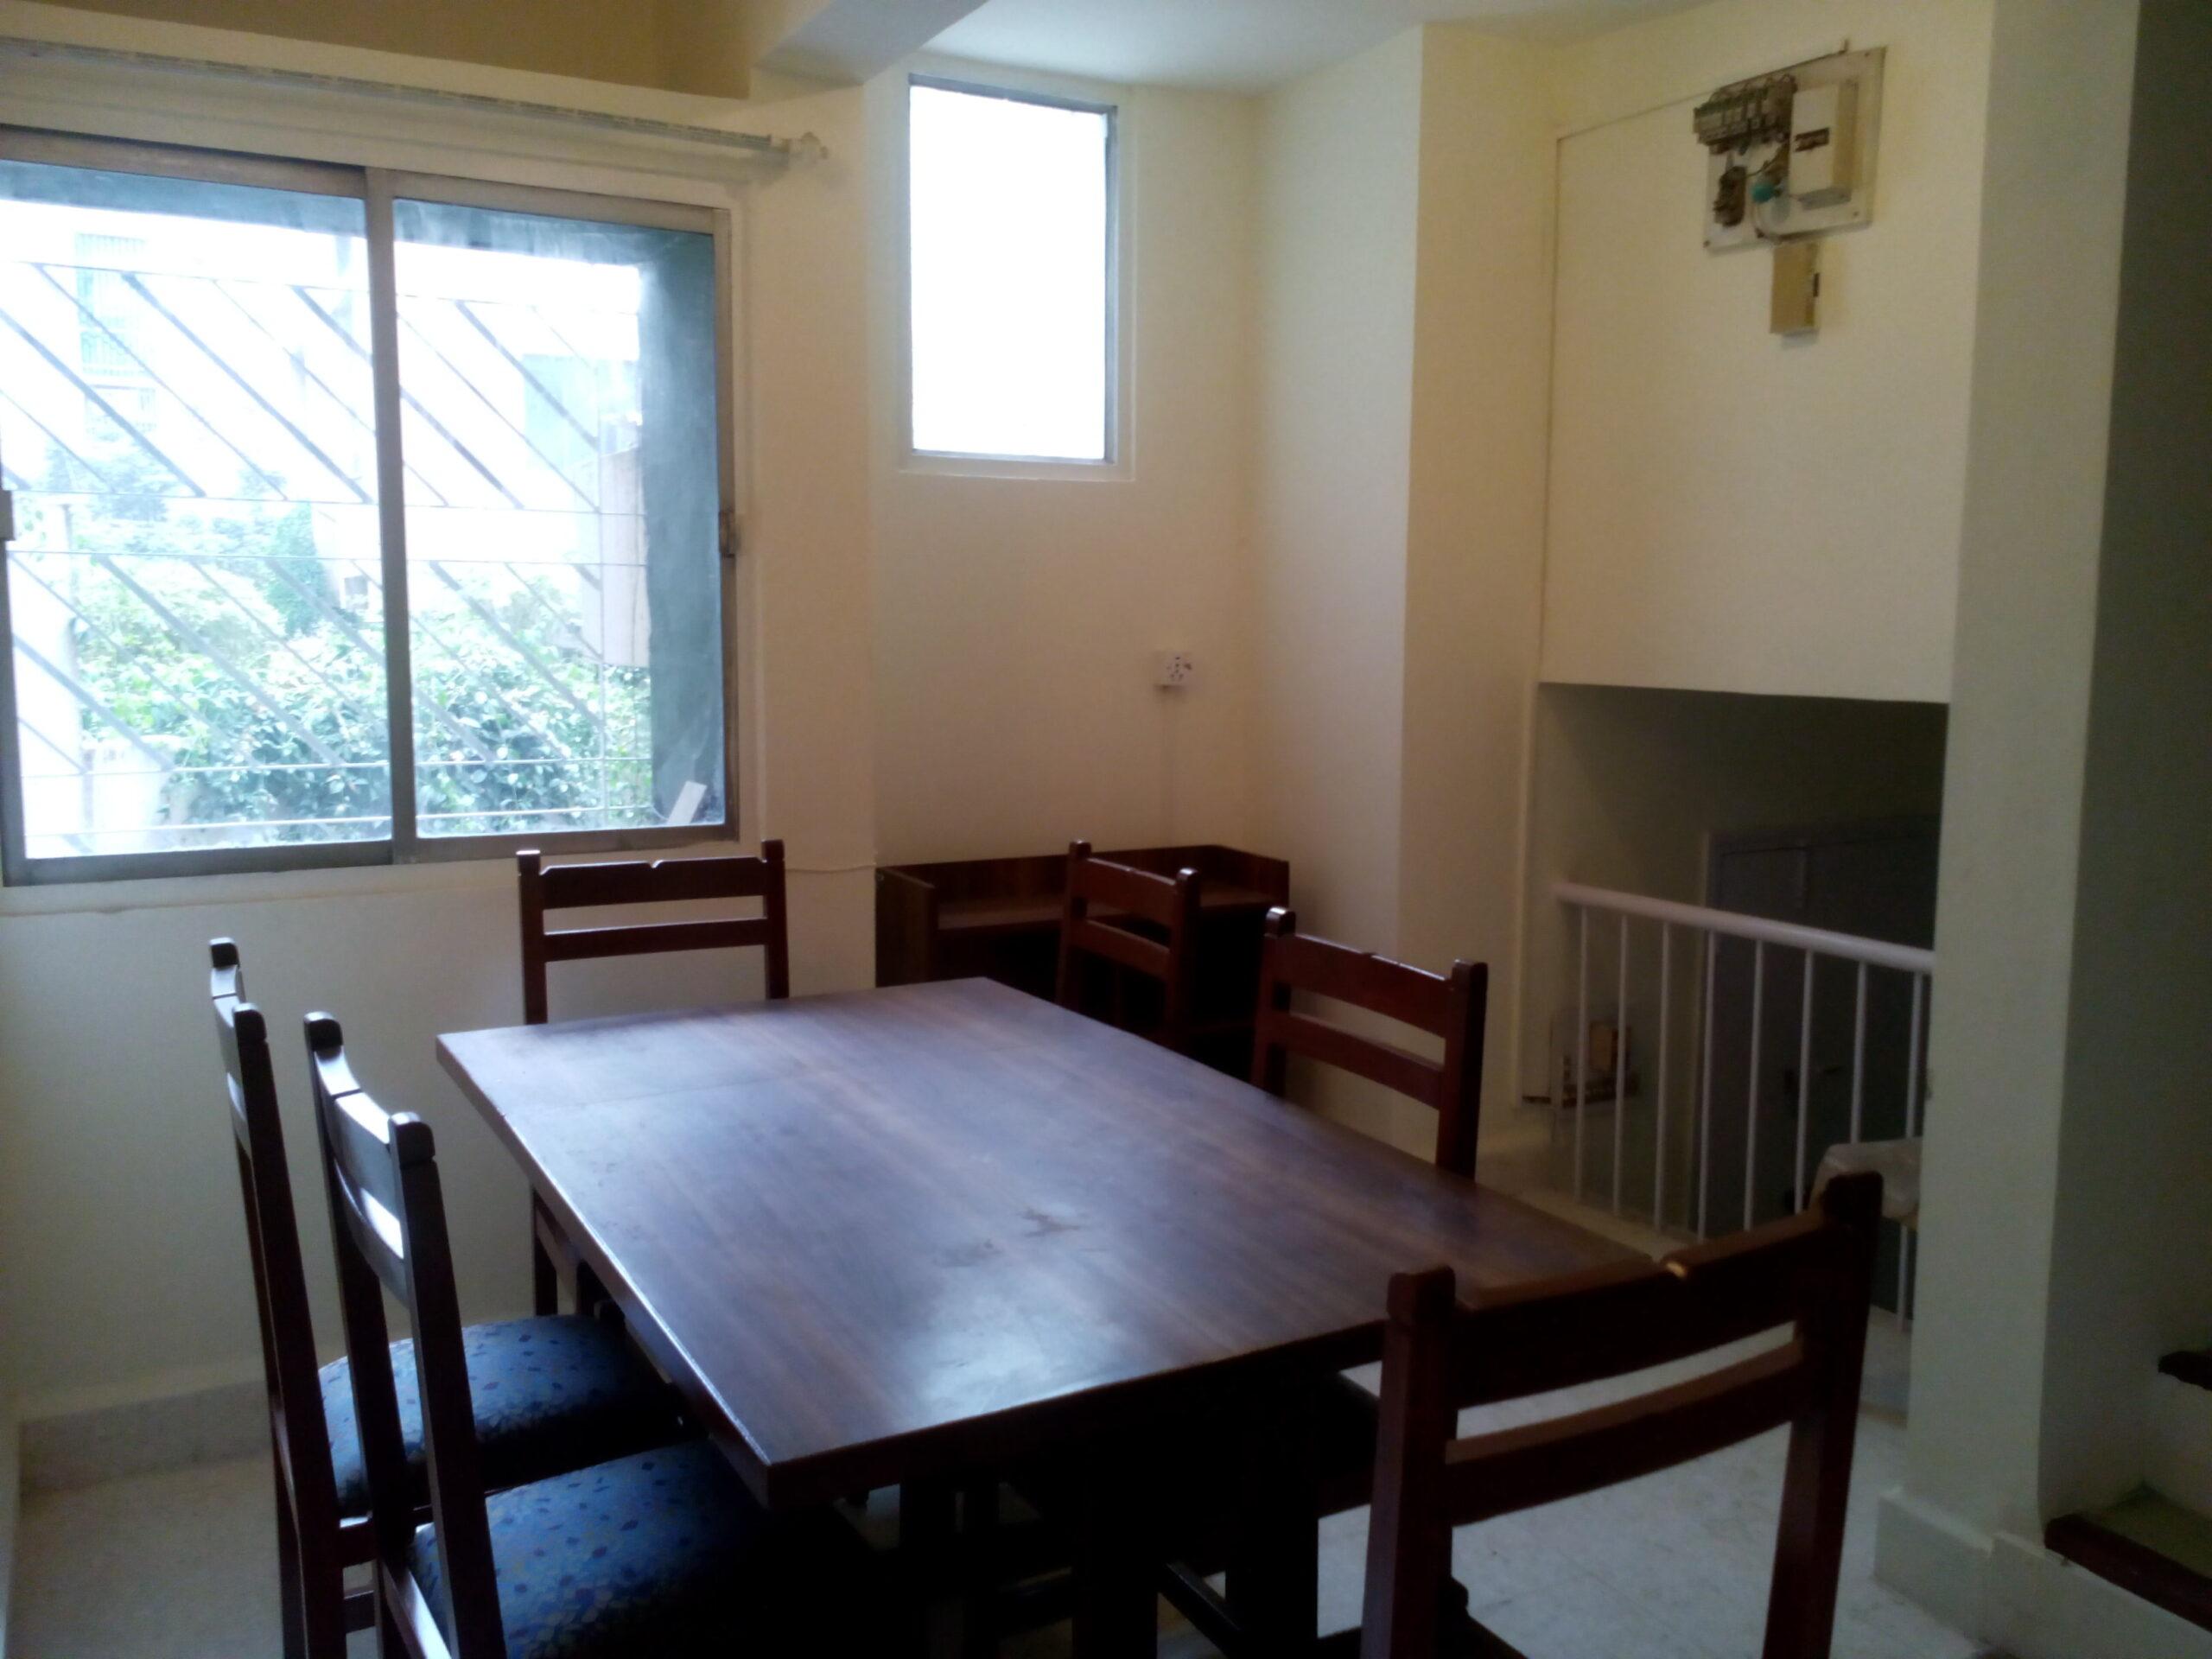 For rent 2 BHK apartment | Maurya | Naylor road Pune